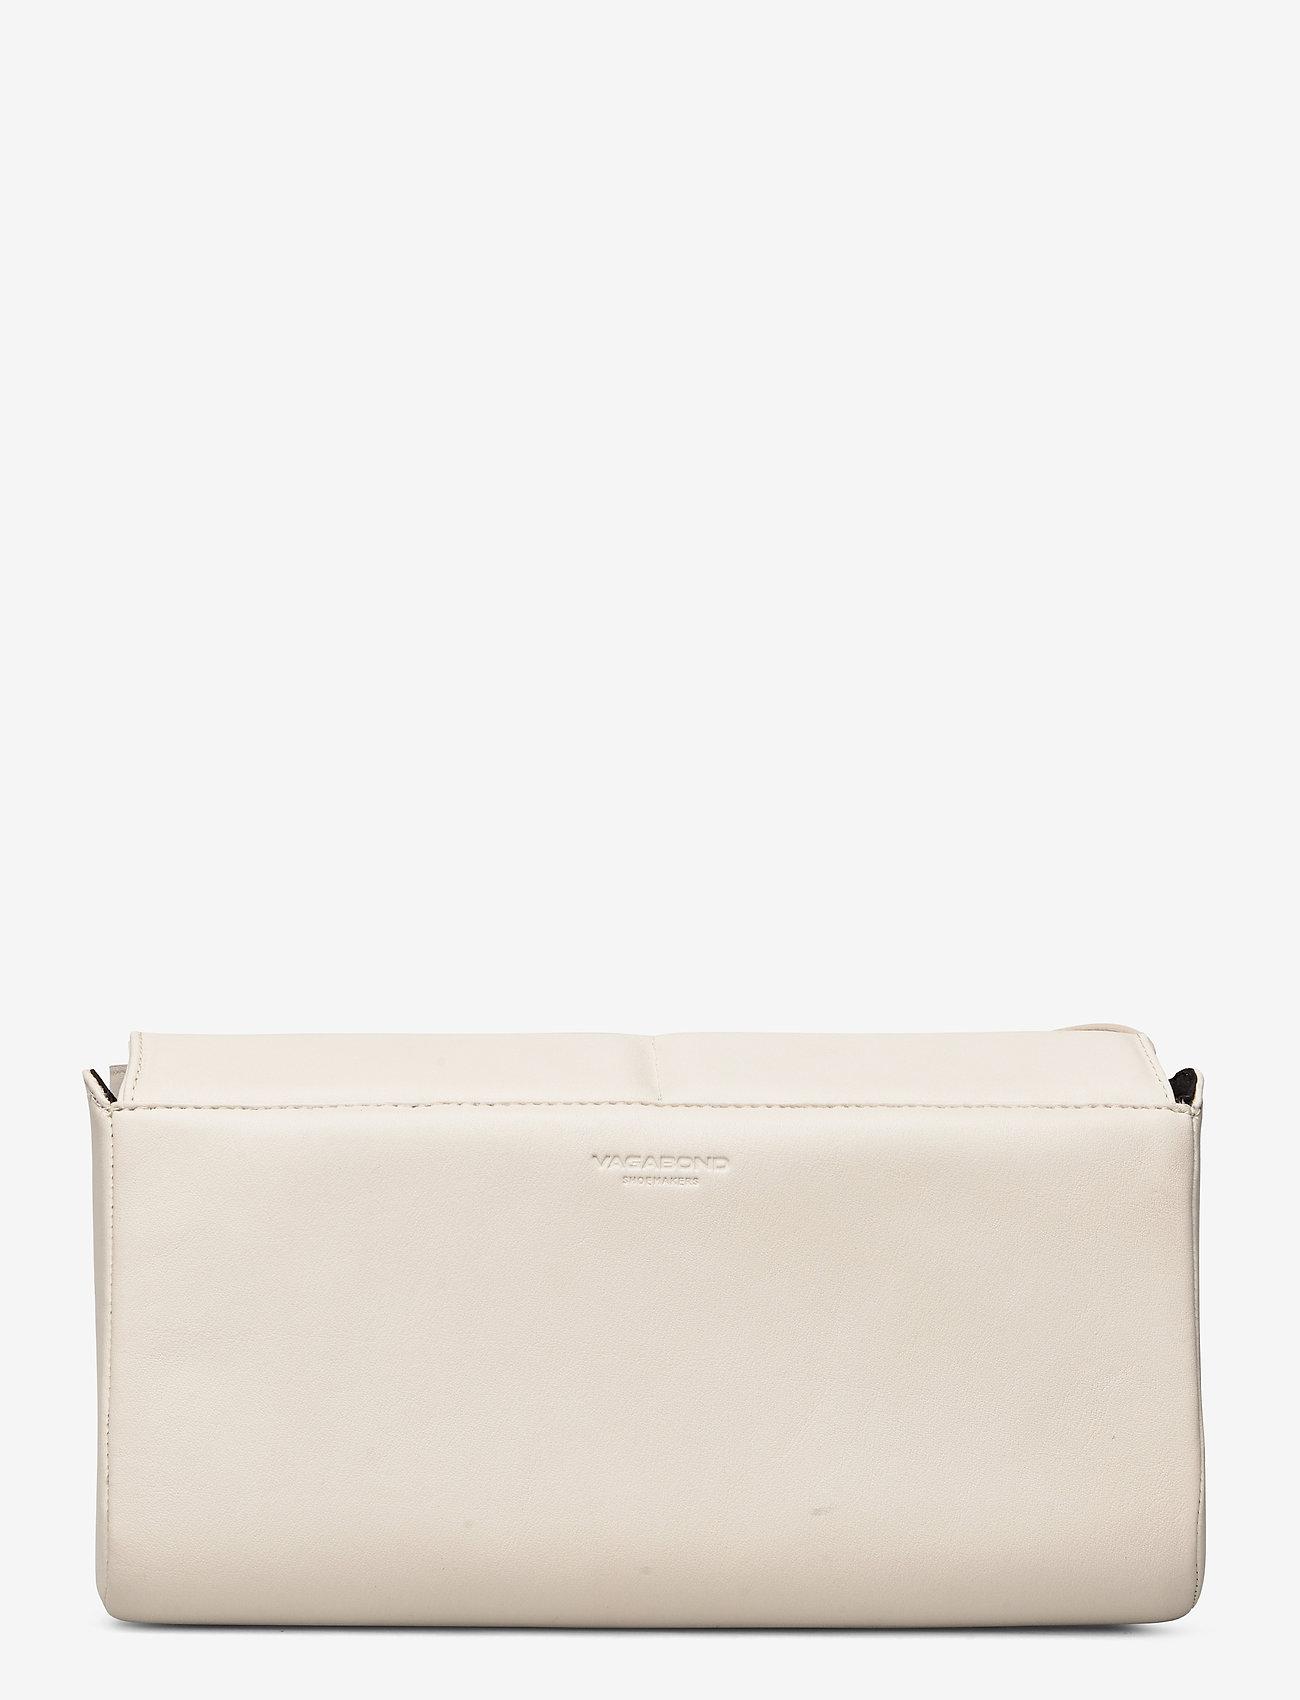 VAGABOND - MALIBU - crossbody bags - off white - 1